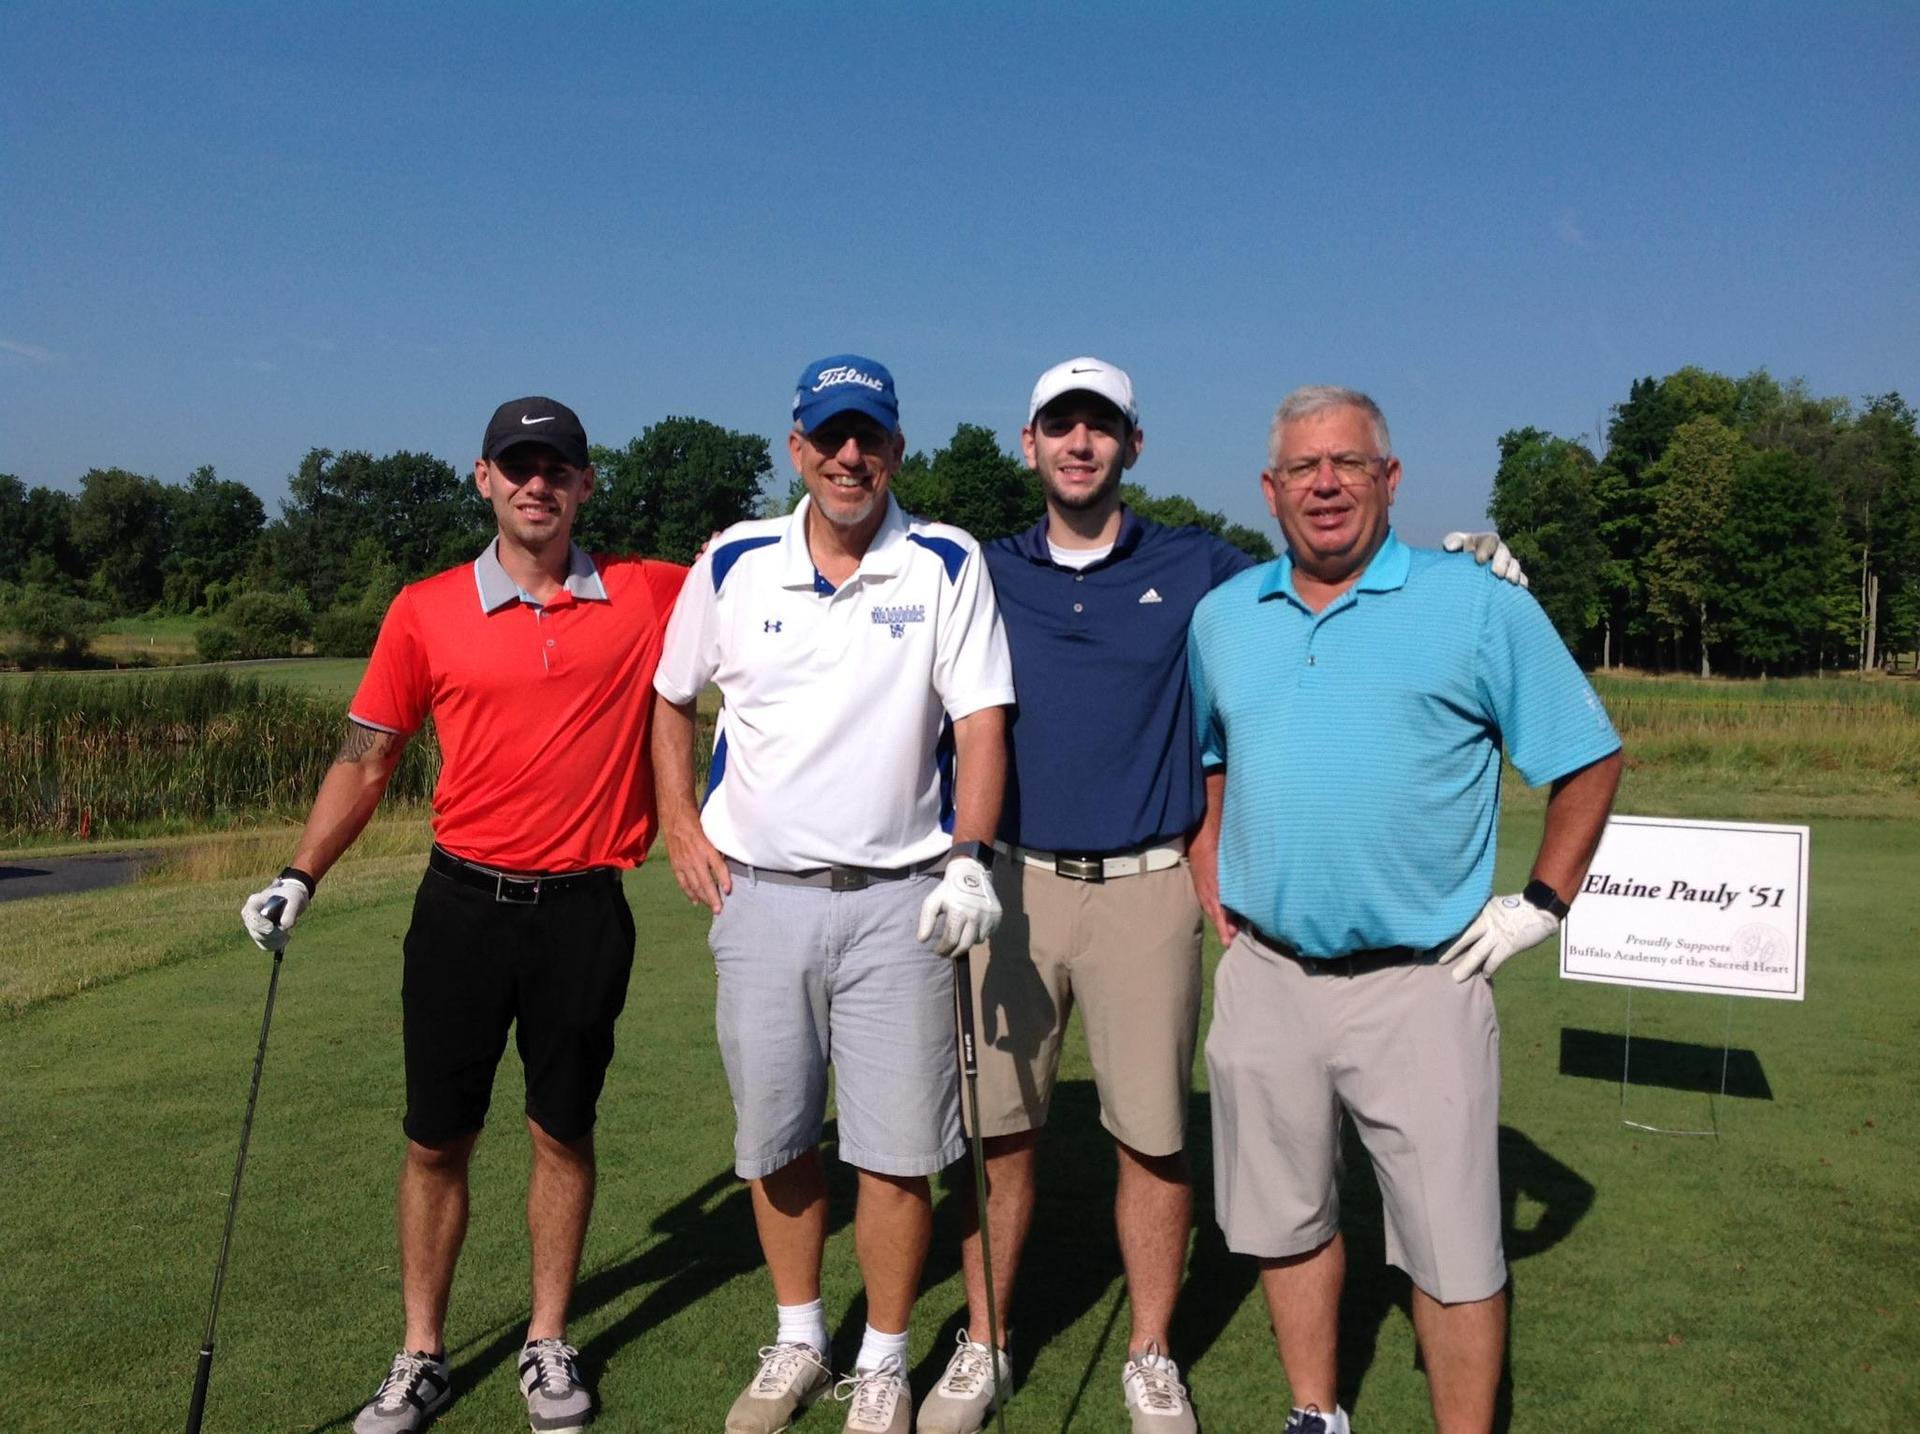 Events- Sister Maria Golf Tournament